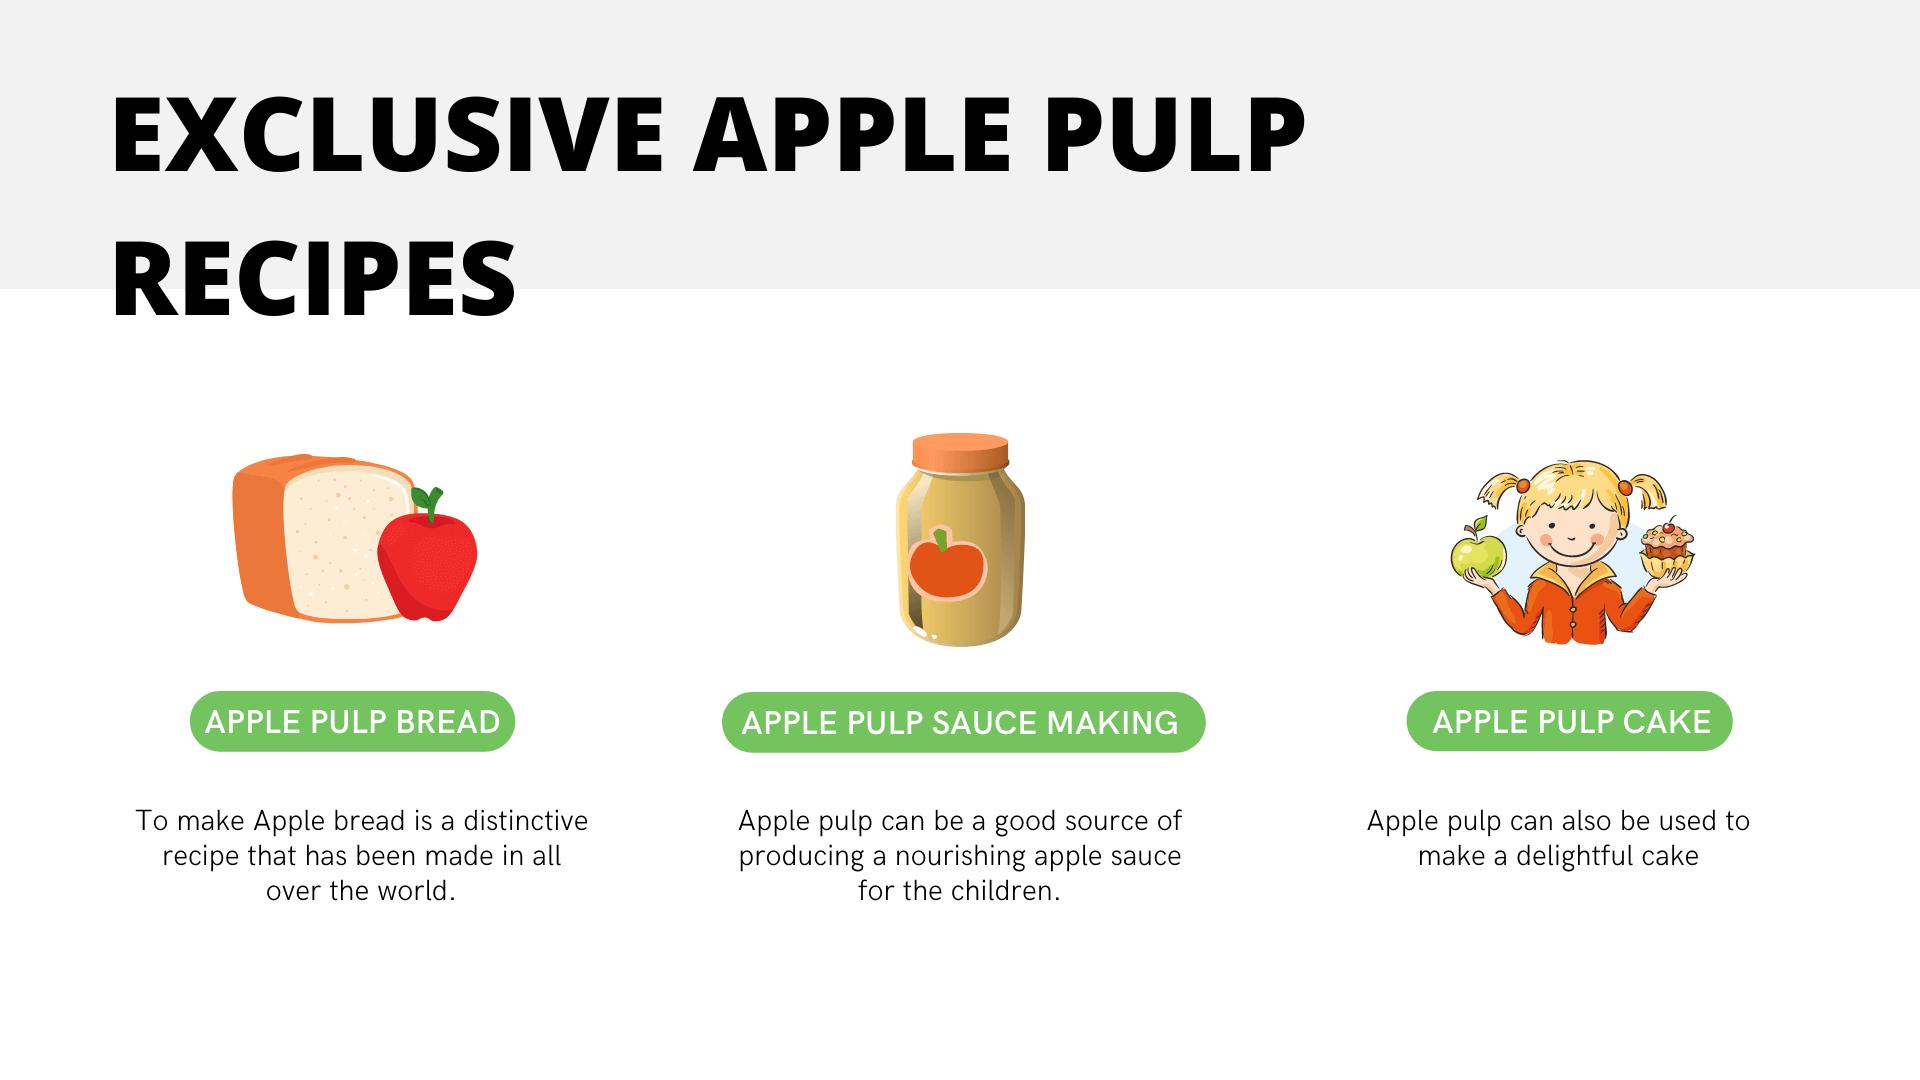 Exclusive apple pulp recipes